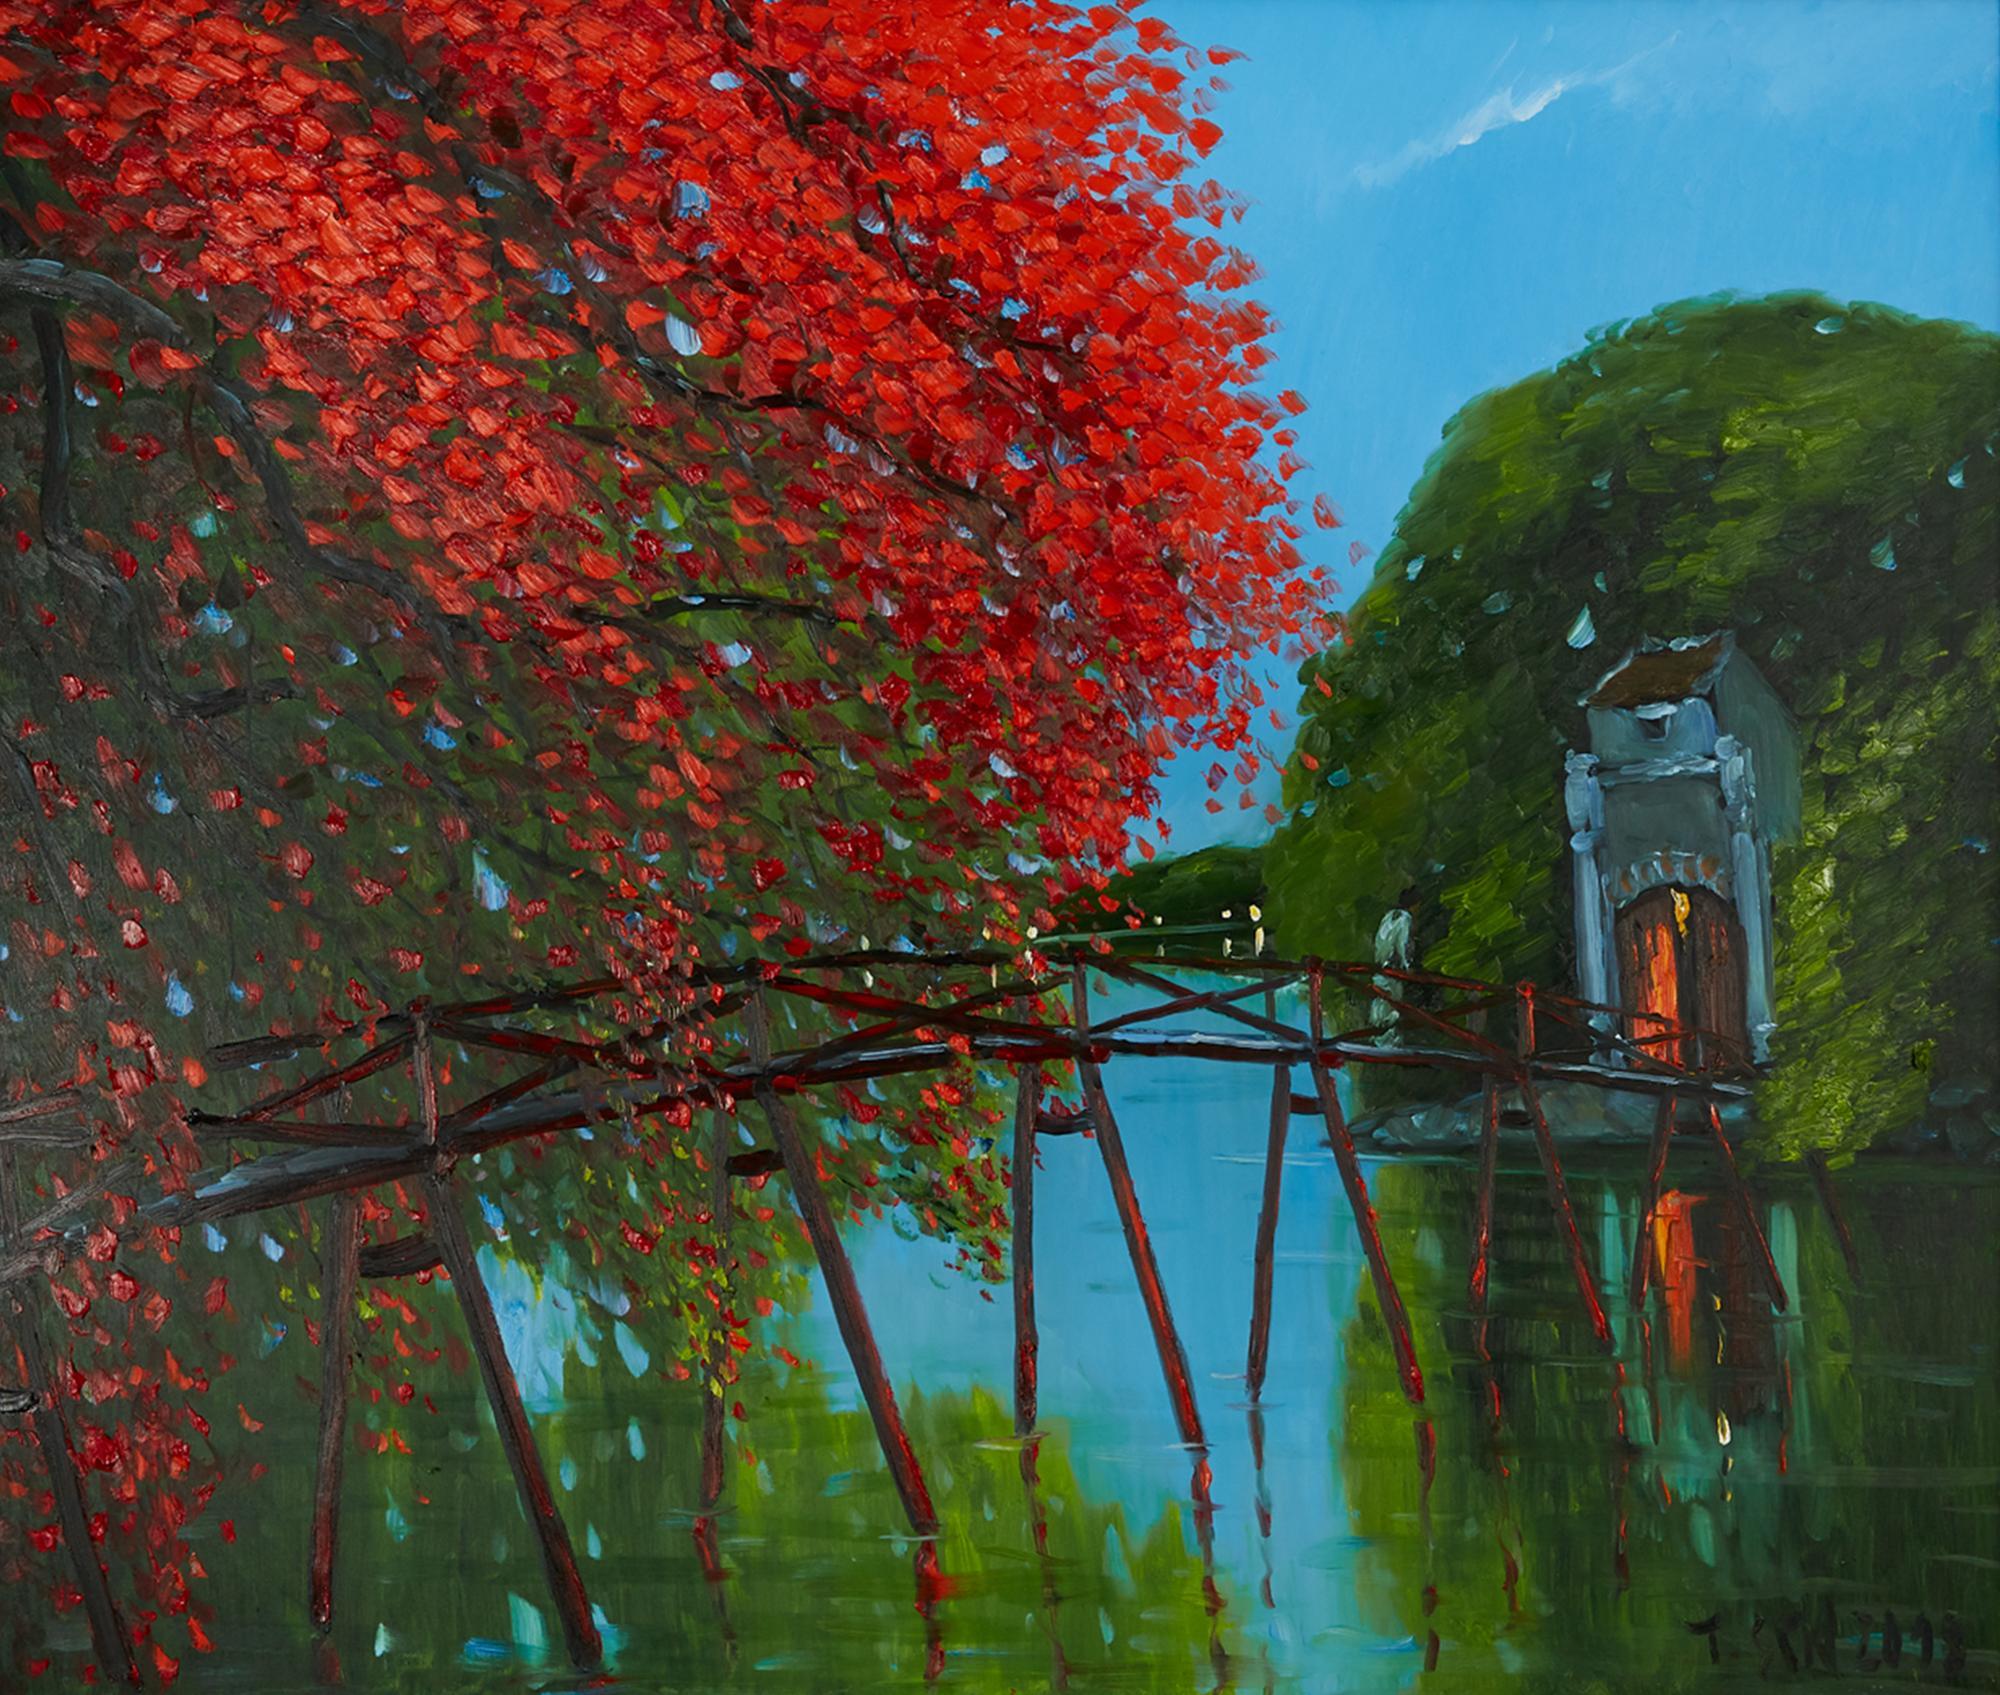 'The Huc Mid Night' Impressionist Landscape Oil Painting